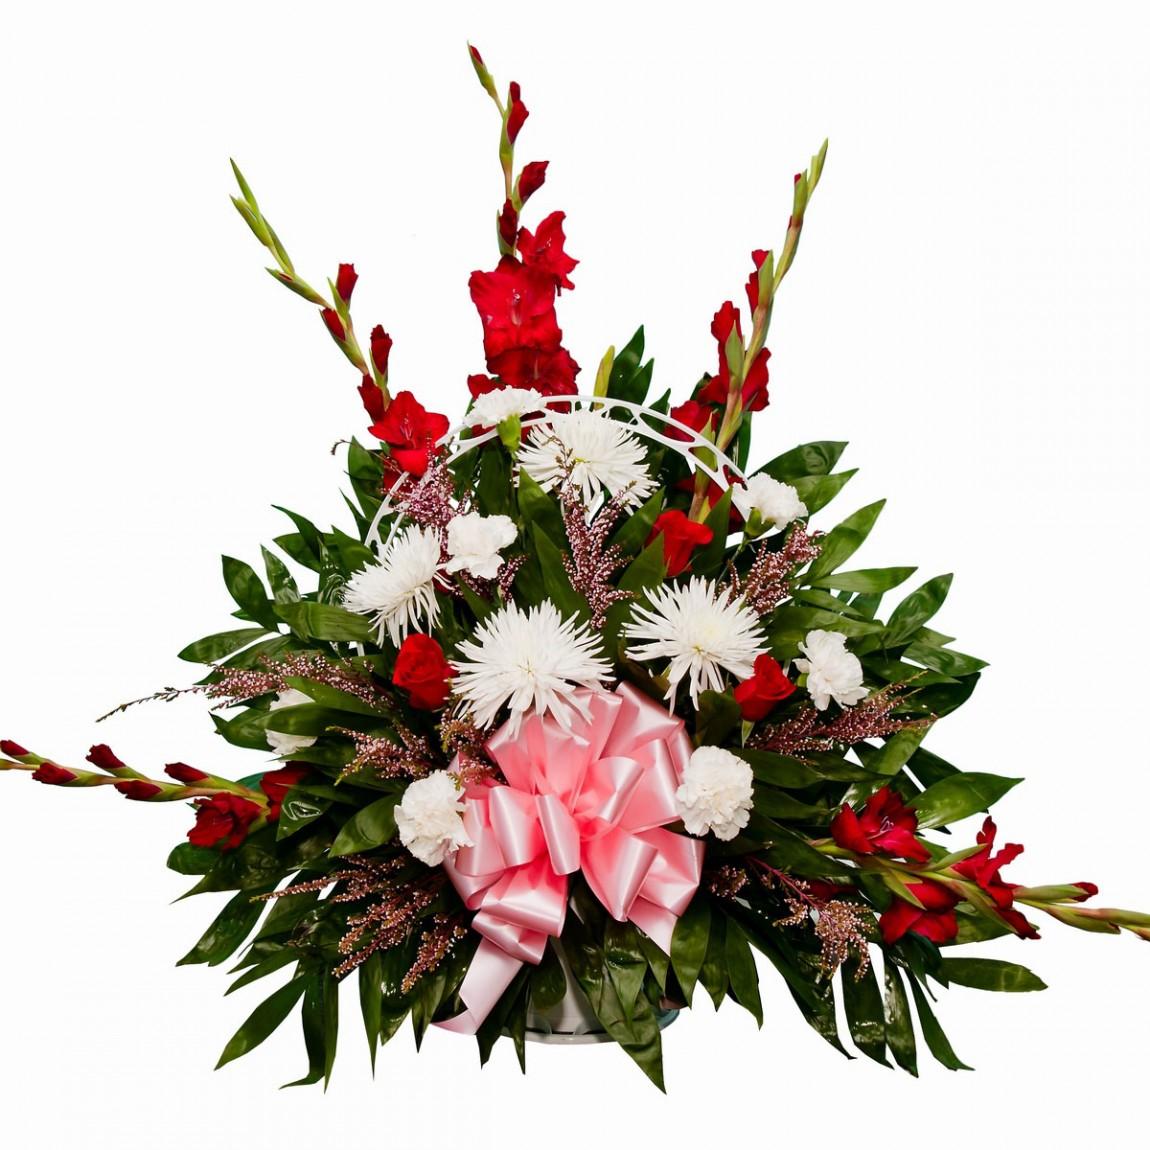 Alexs Flowers